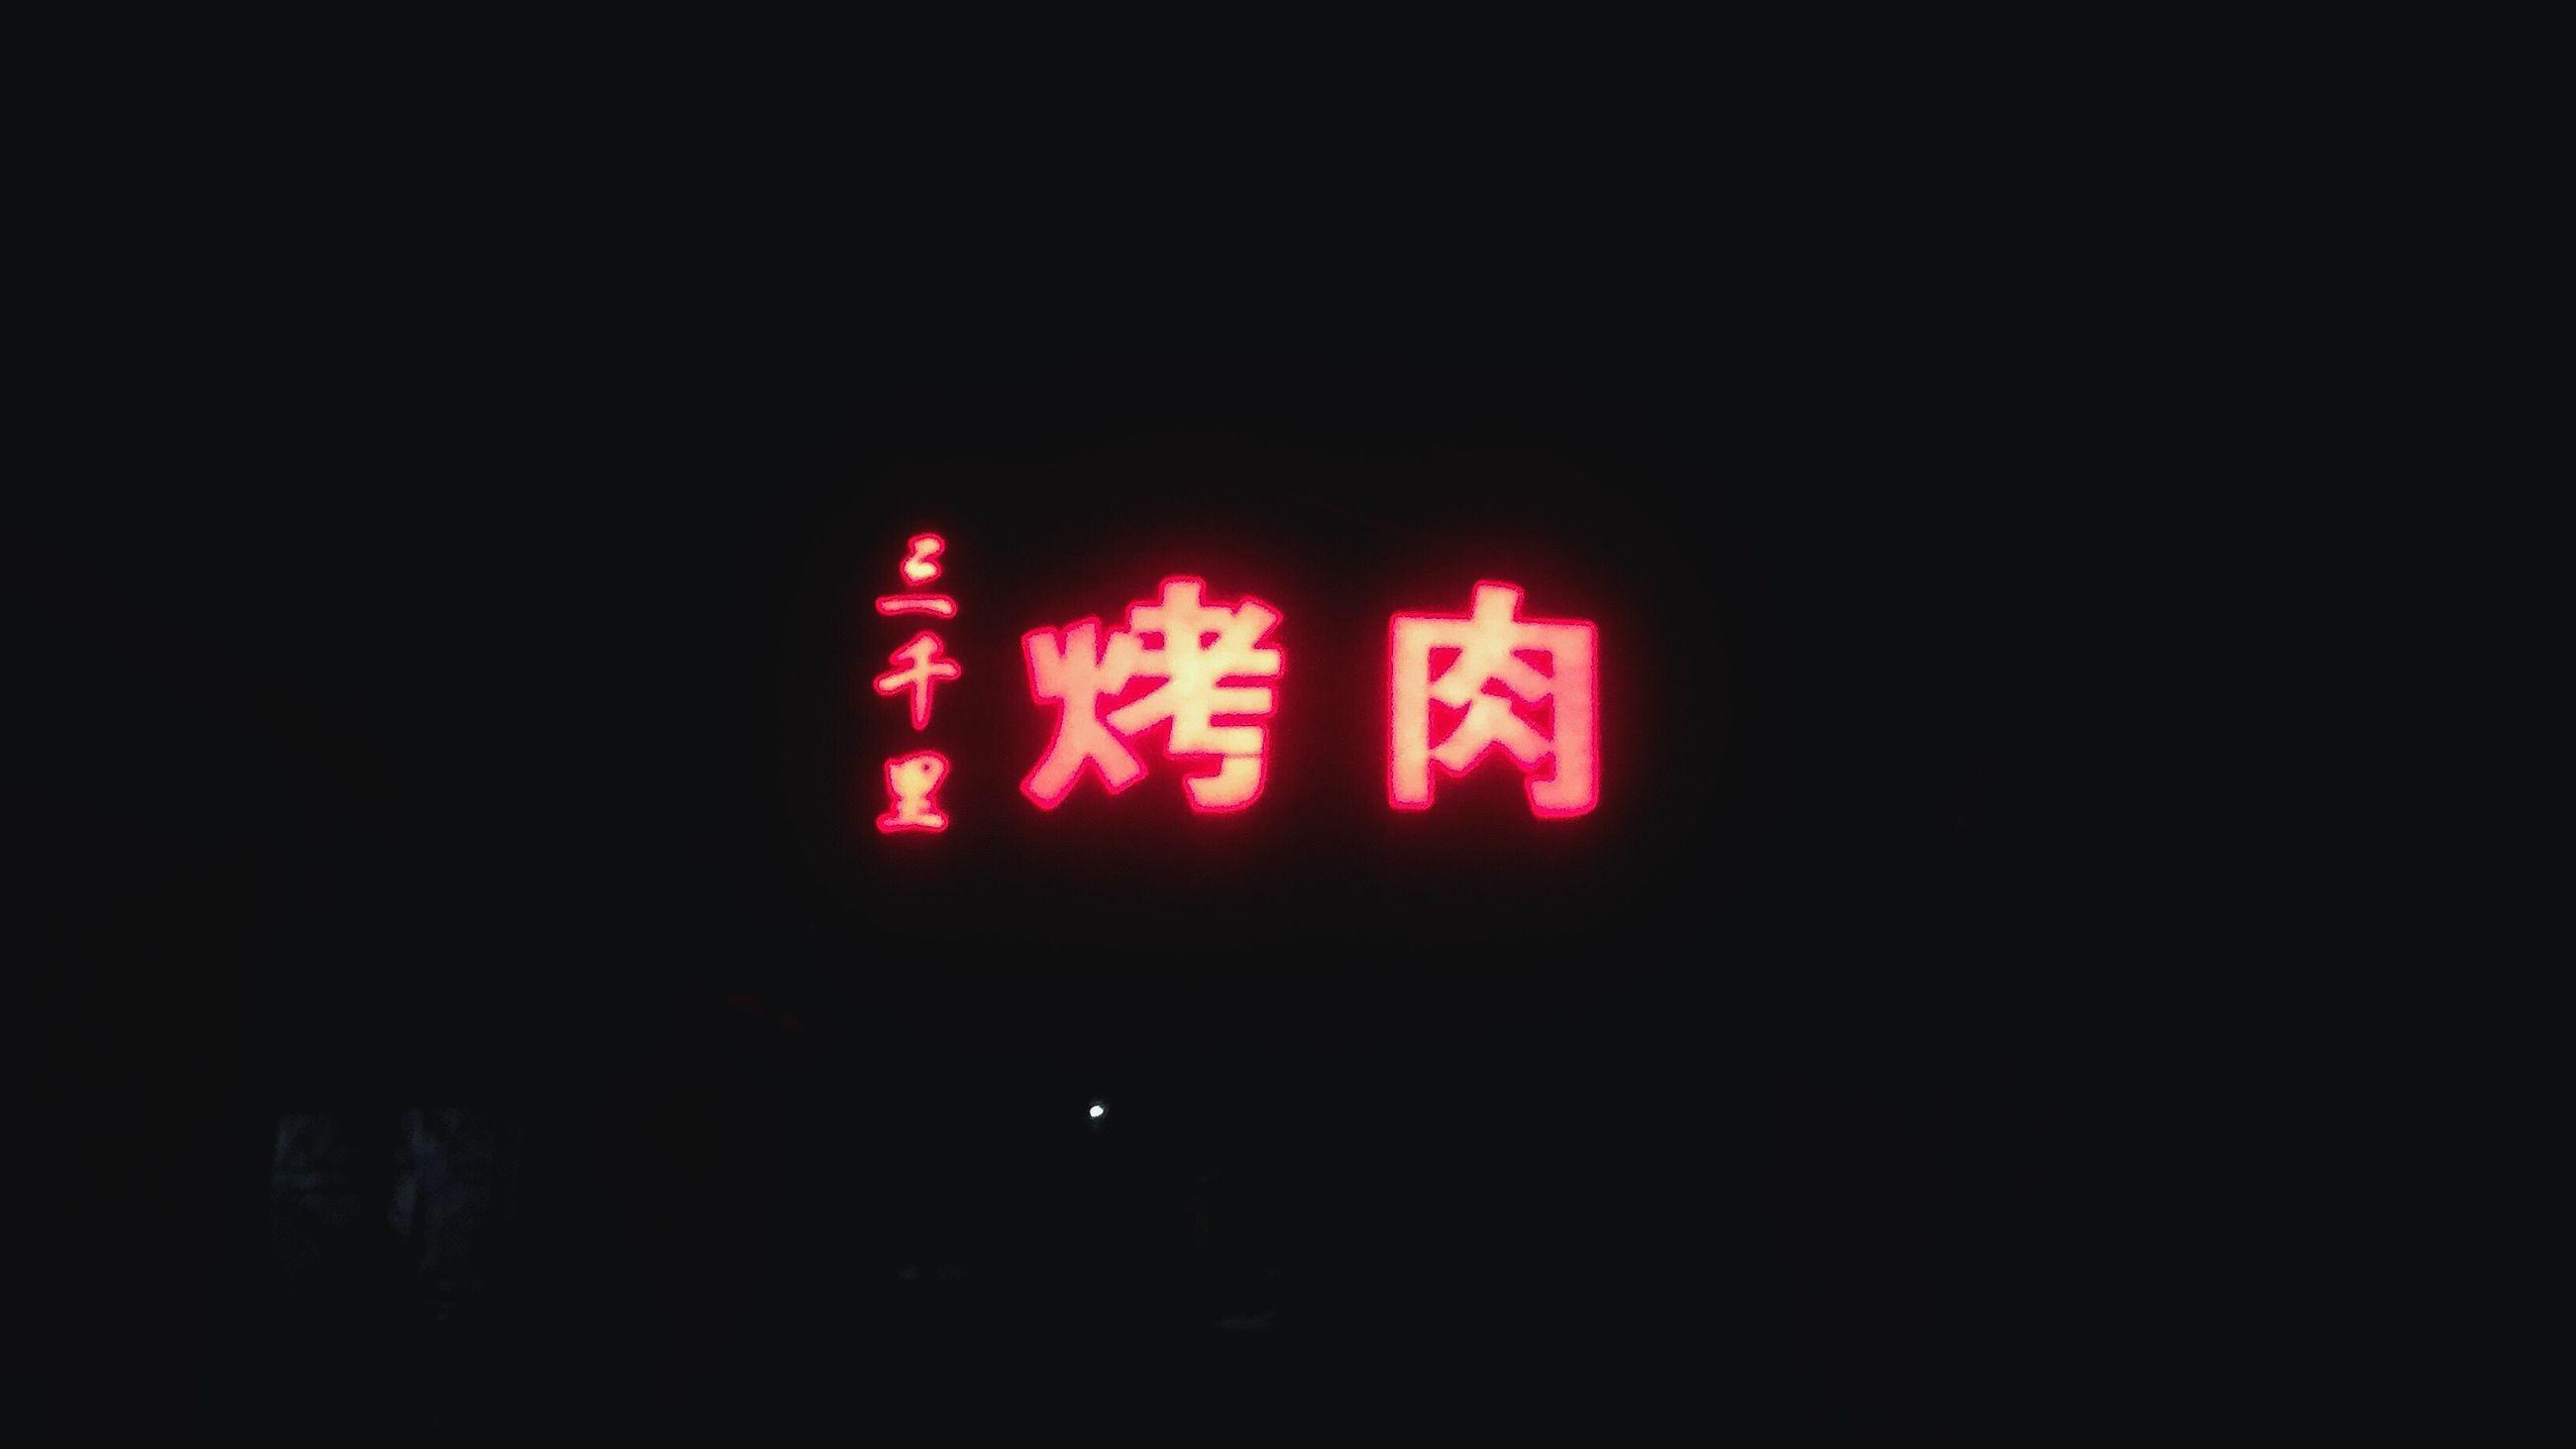 number, digital display, red, illuminated, time, darkroom, alarm clock, close-up, no people, indoors, black background